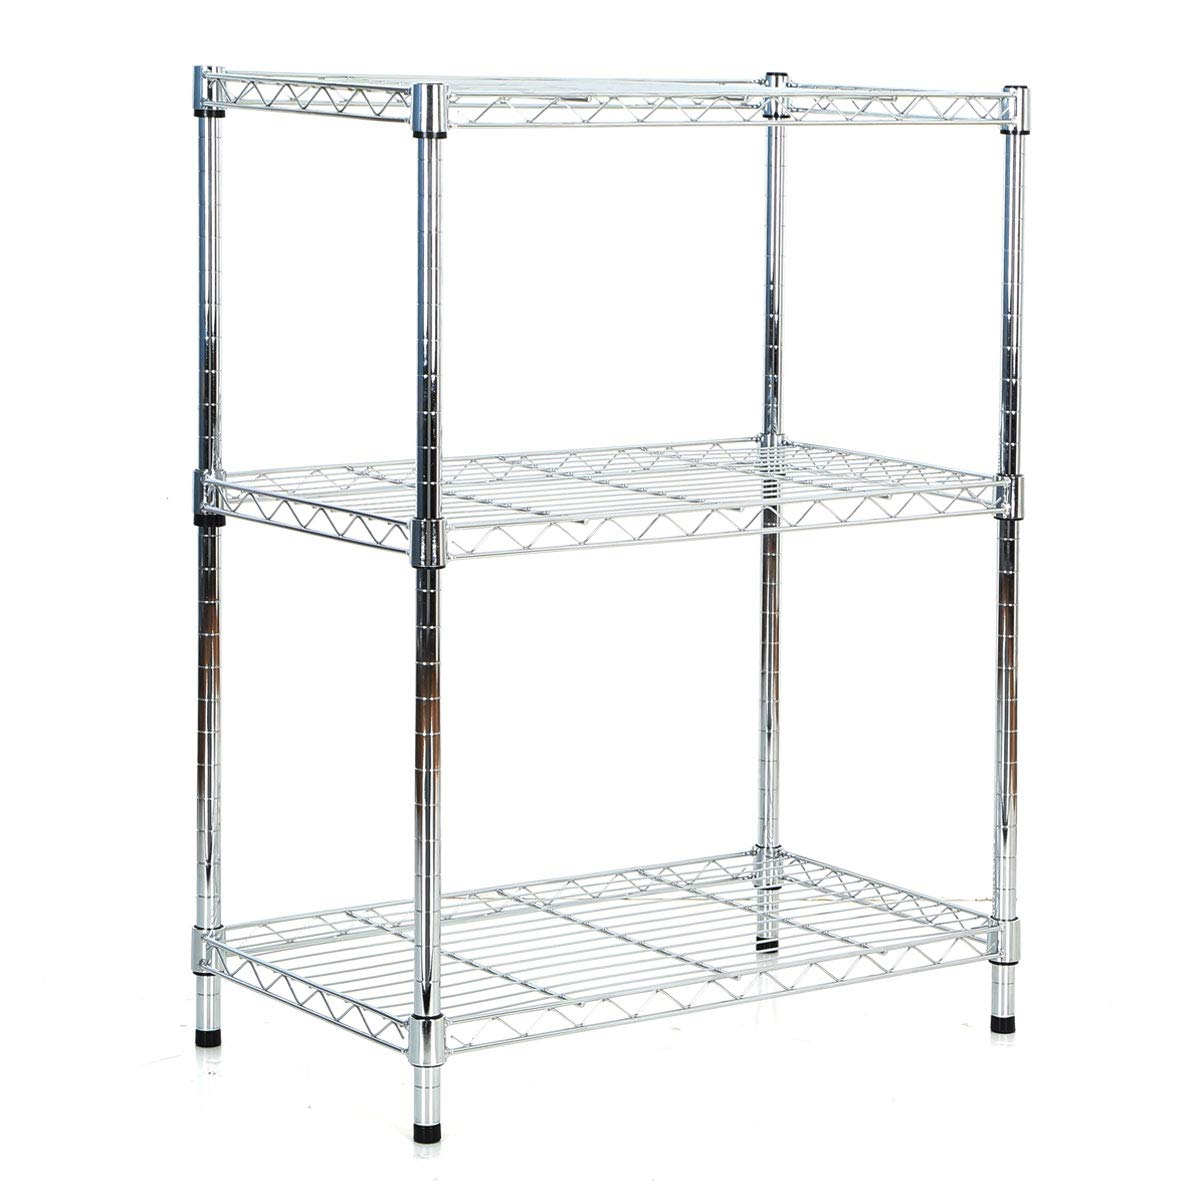 3 Tier Wire Shelving Metal Shelf Storage Rack Durable Organizer Unit for Kitchen Garage Pantry Organization - Chrome, 23'' W x 13'' D x 30'' H